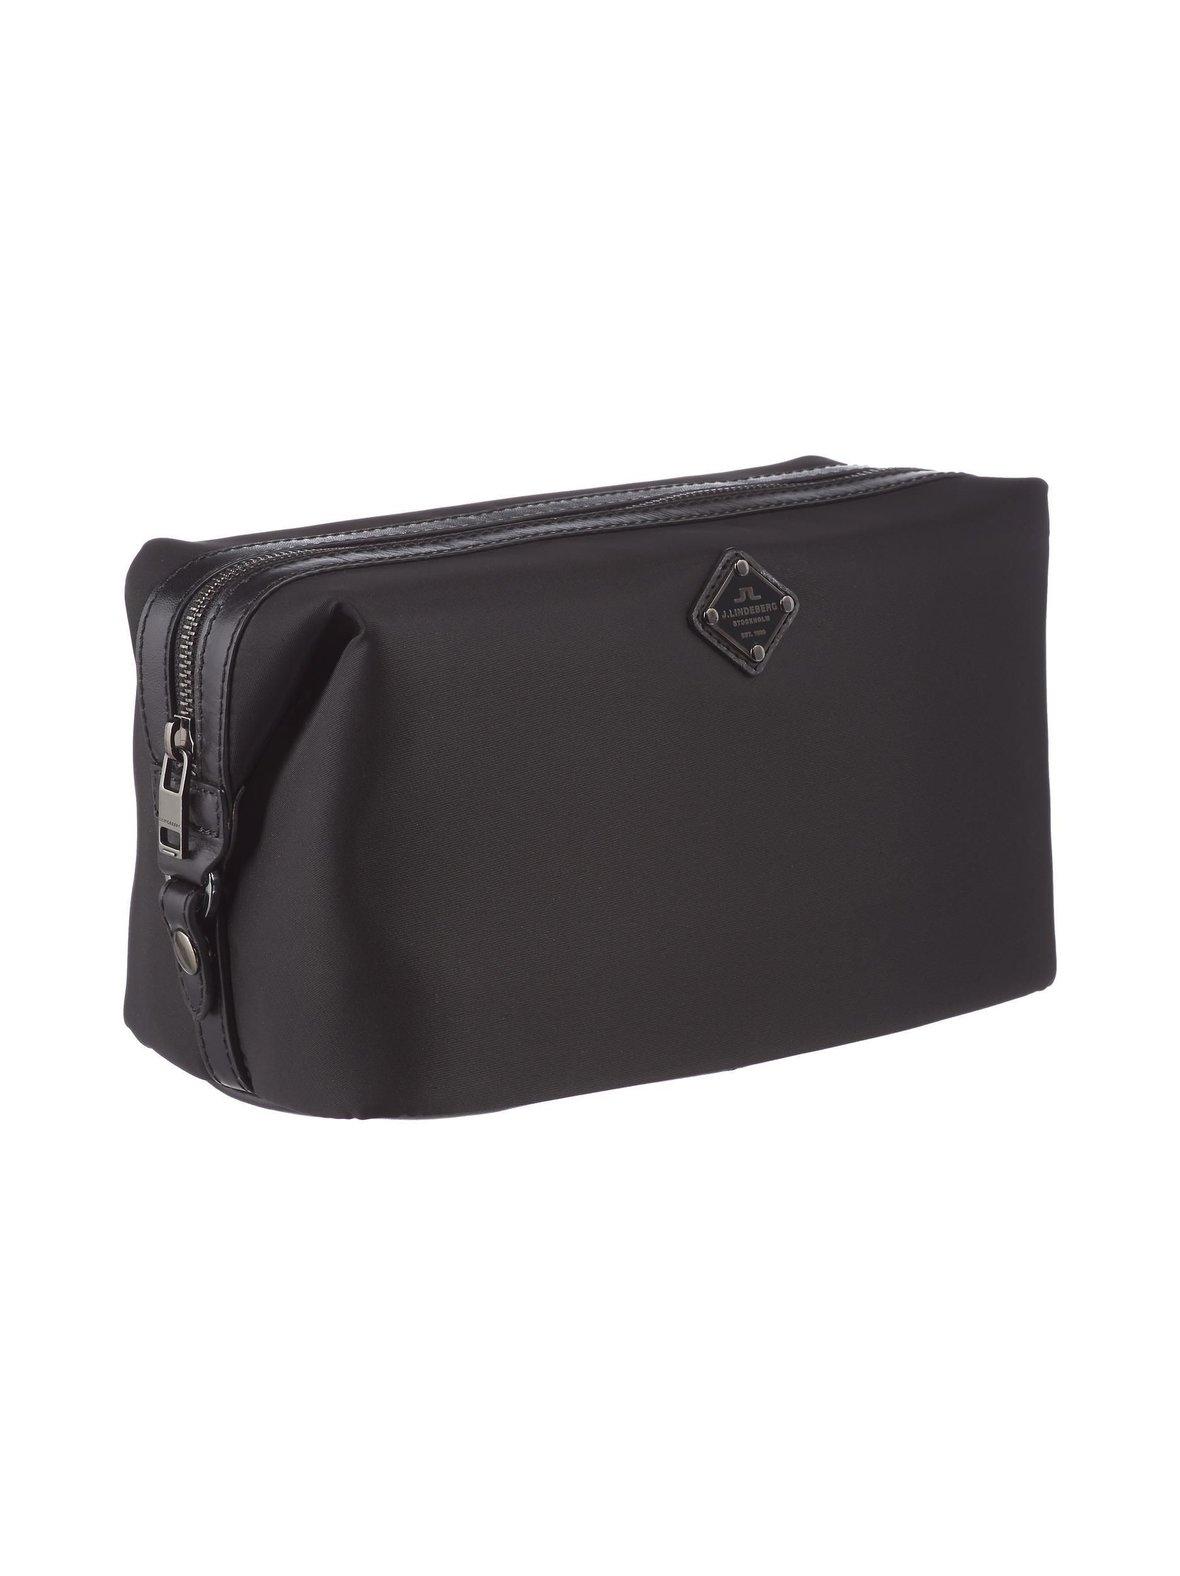 Toilettilaukku 5000324 BlackmustaJ 15 X lindeberg Iggy CQrxtdsh